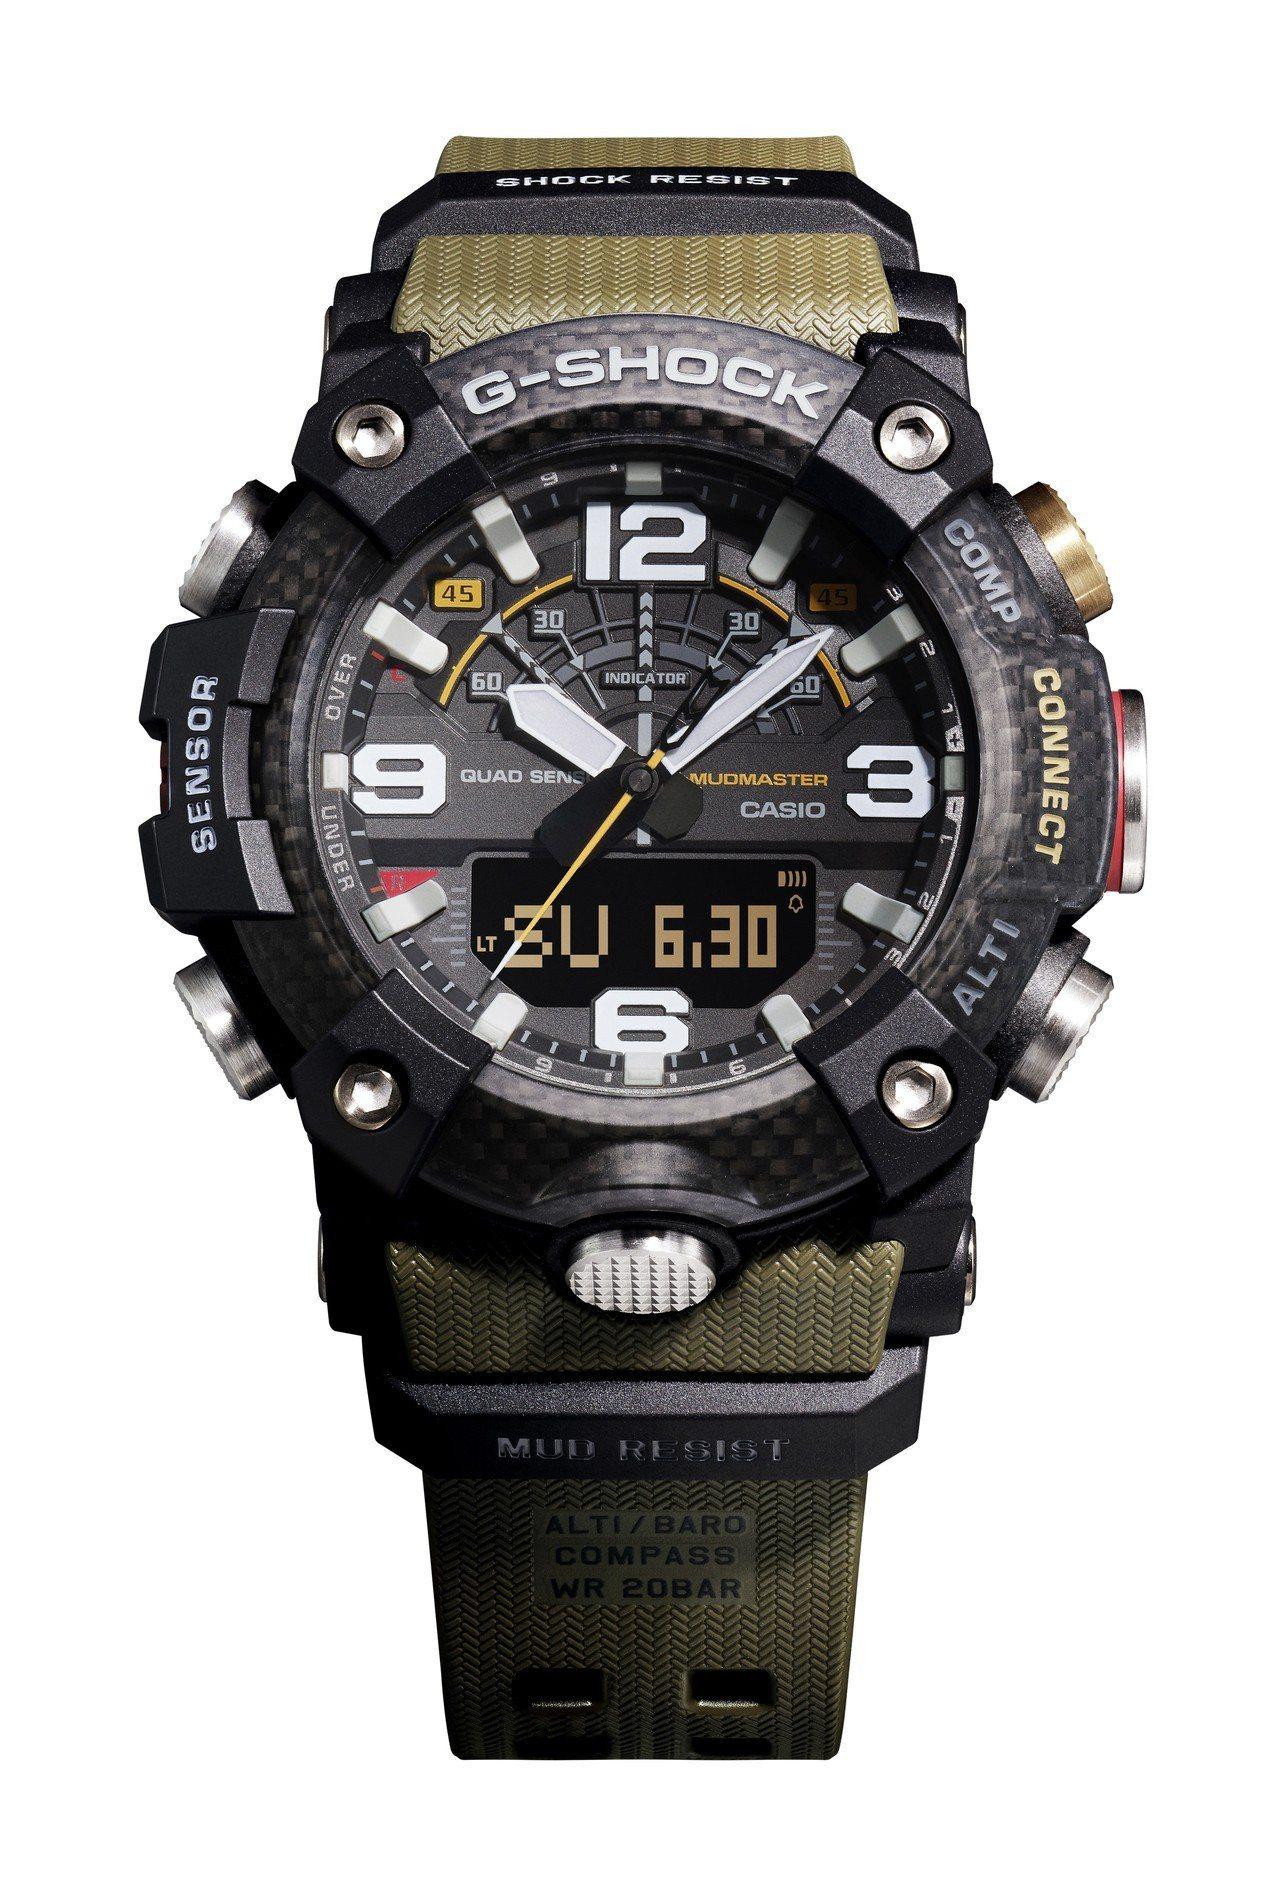 G-Shock GG-B100-1A3腕表,碳纖維表殼、表圈,11,000元。圖...